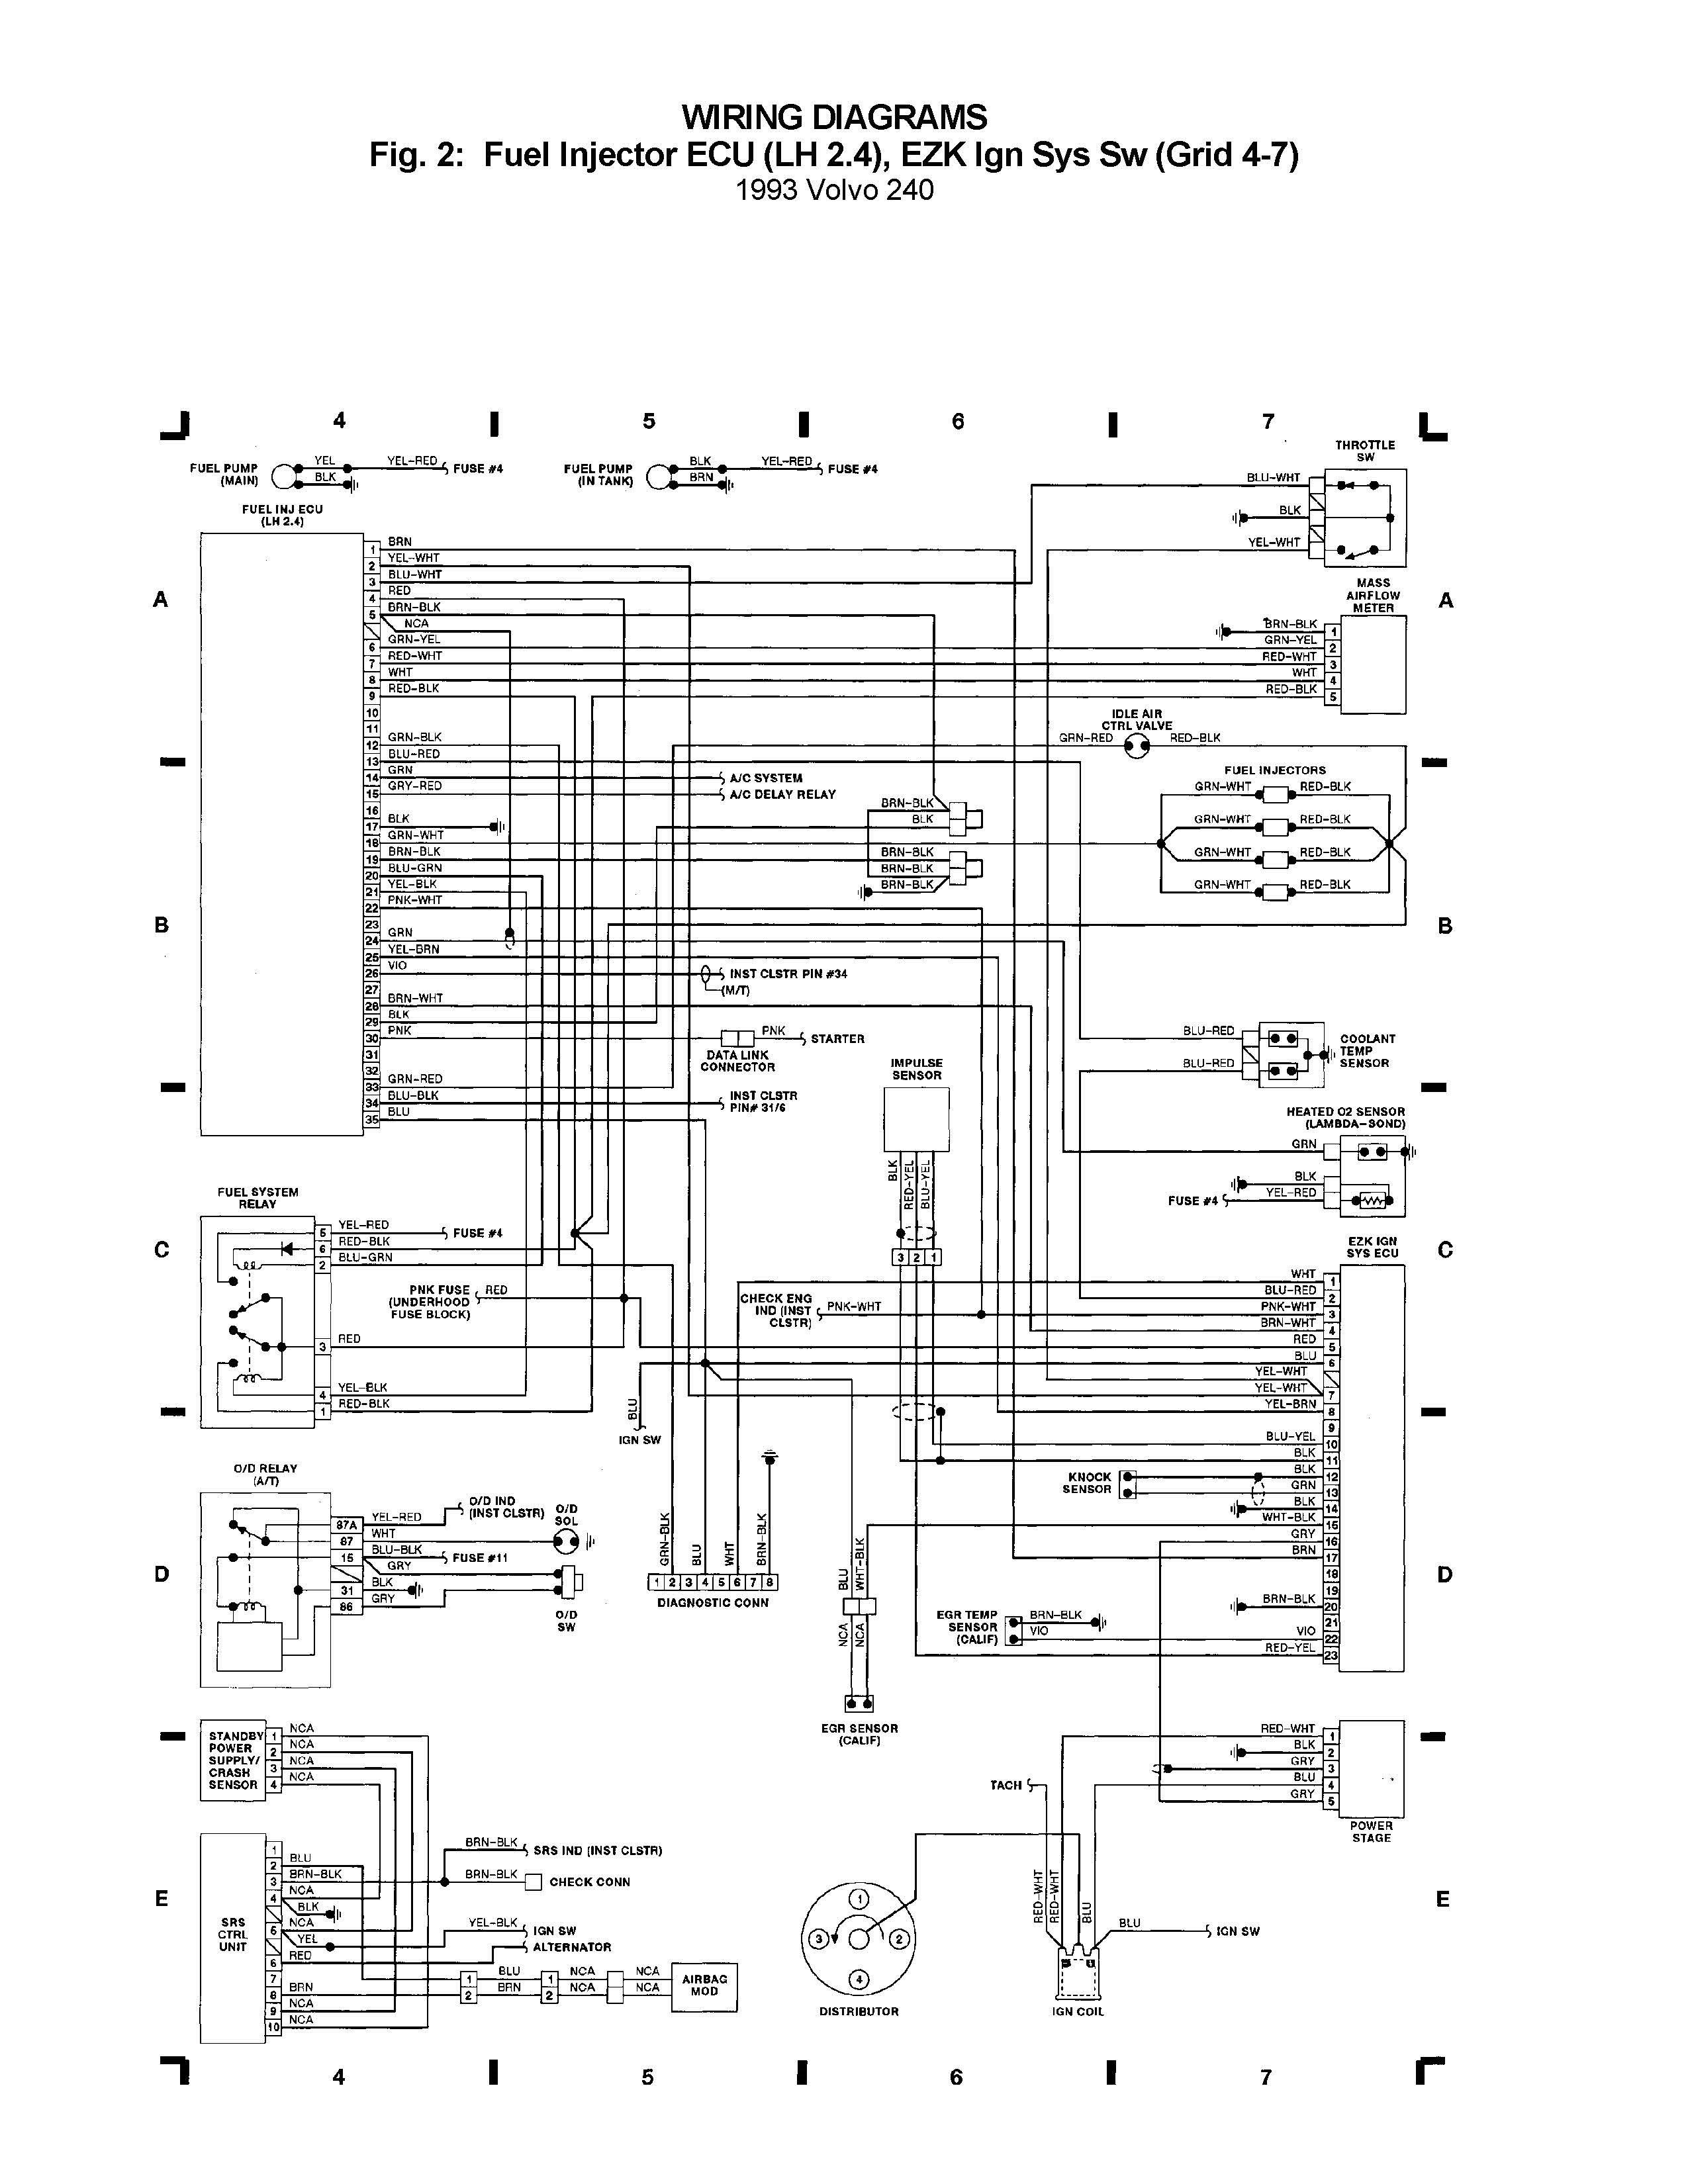 volvo 240 wiring diagram fuel injector ecu lh 24 ezk ign sys sw